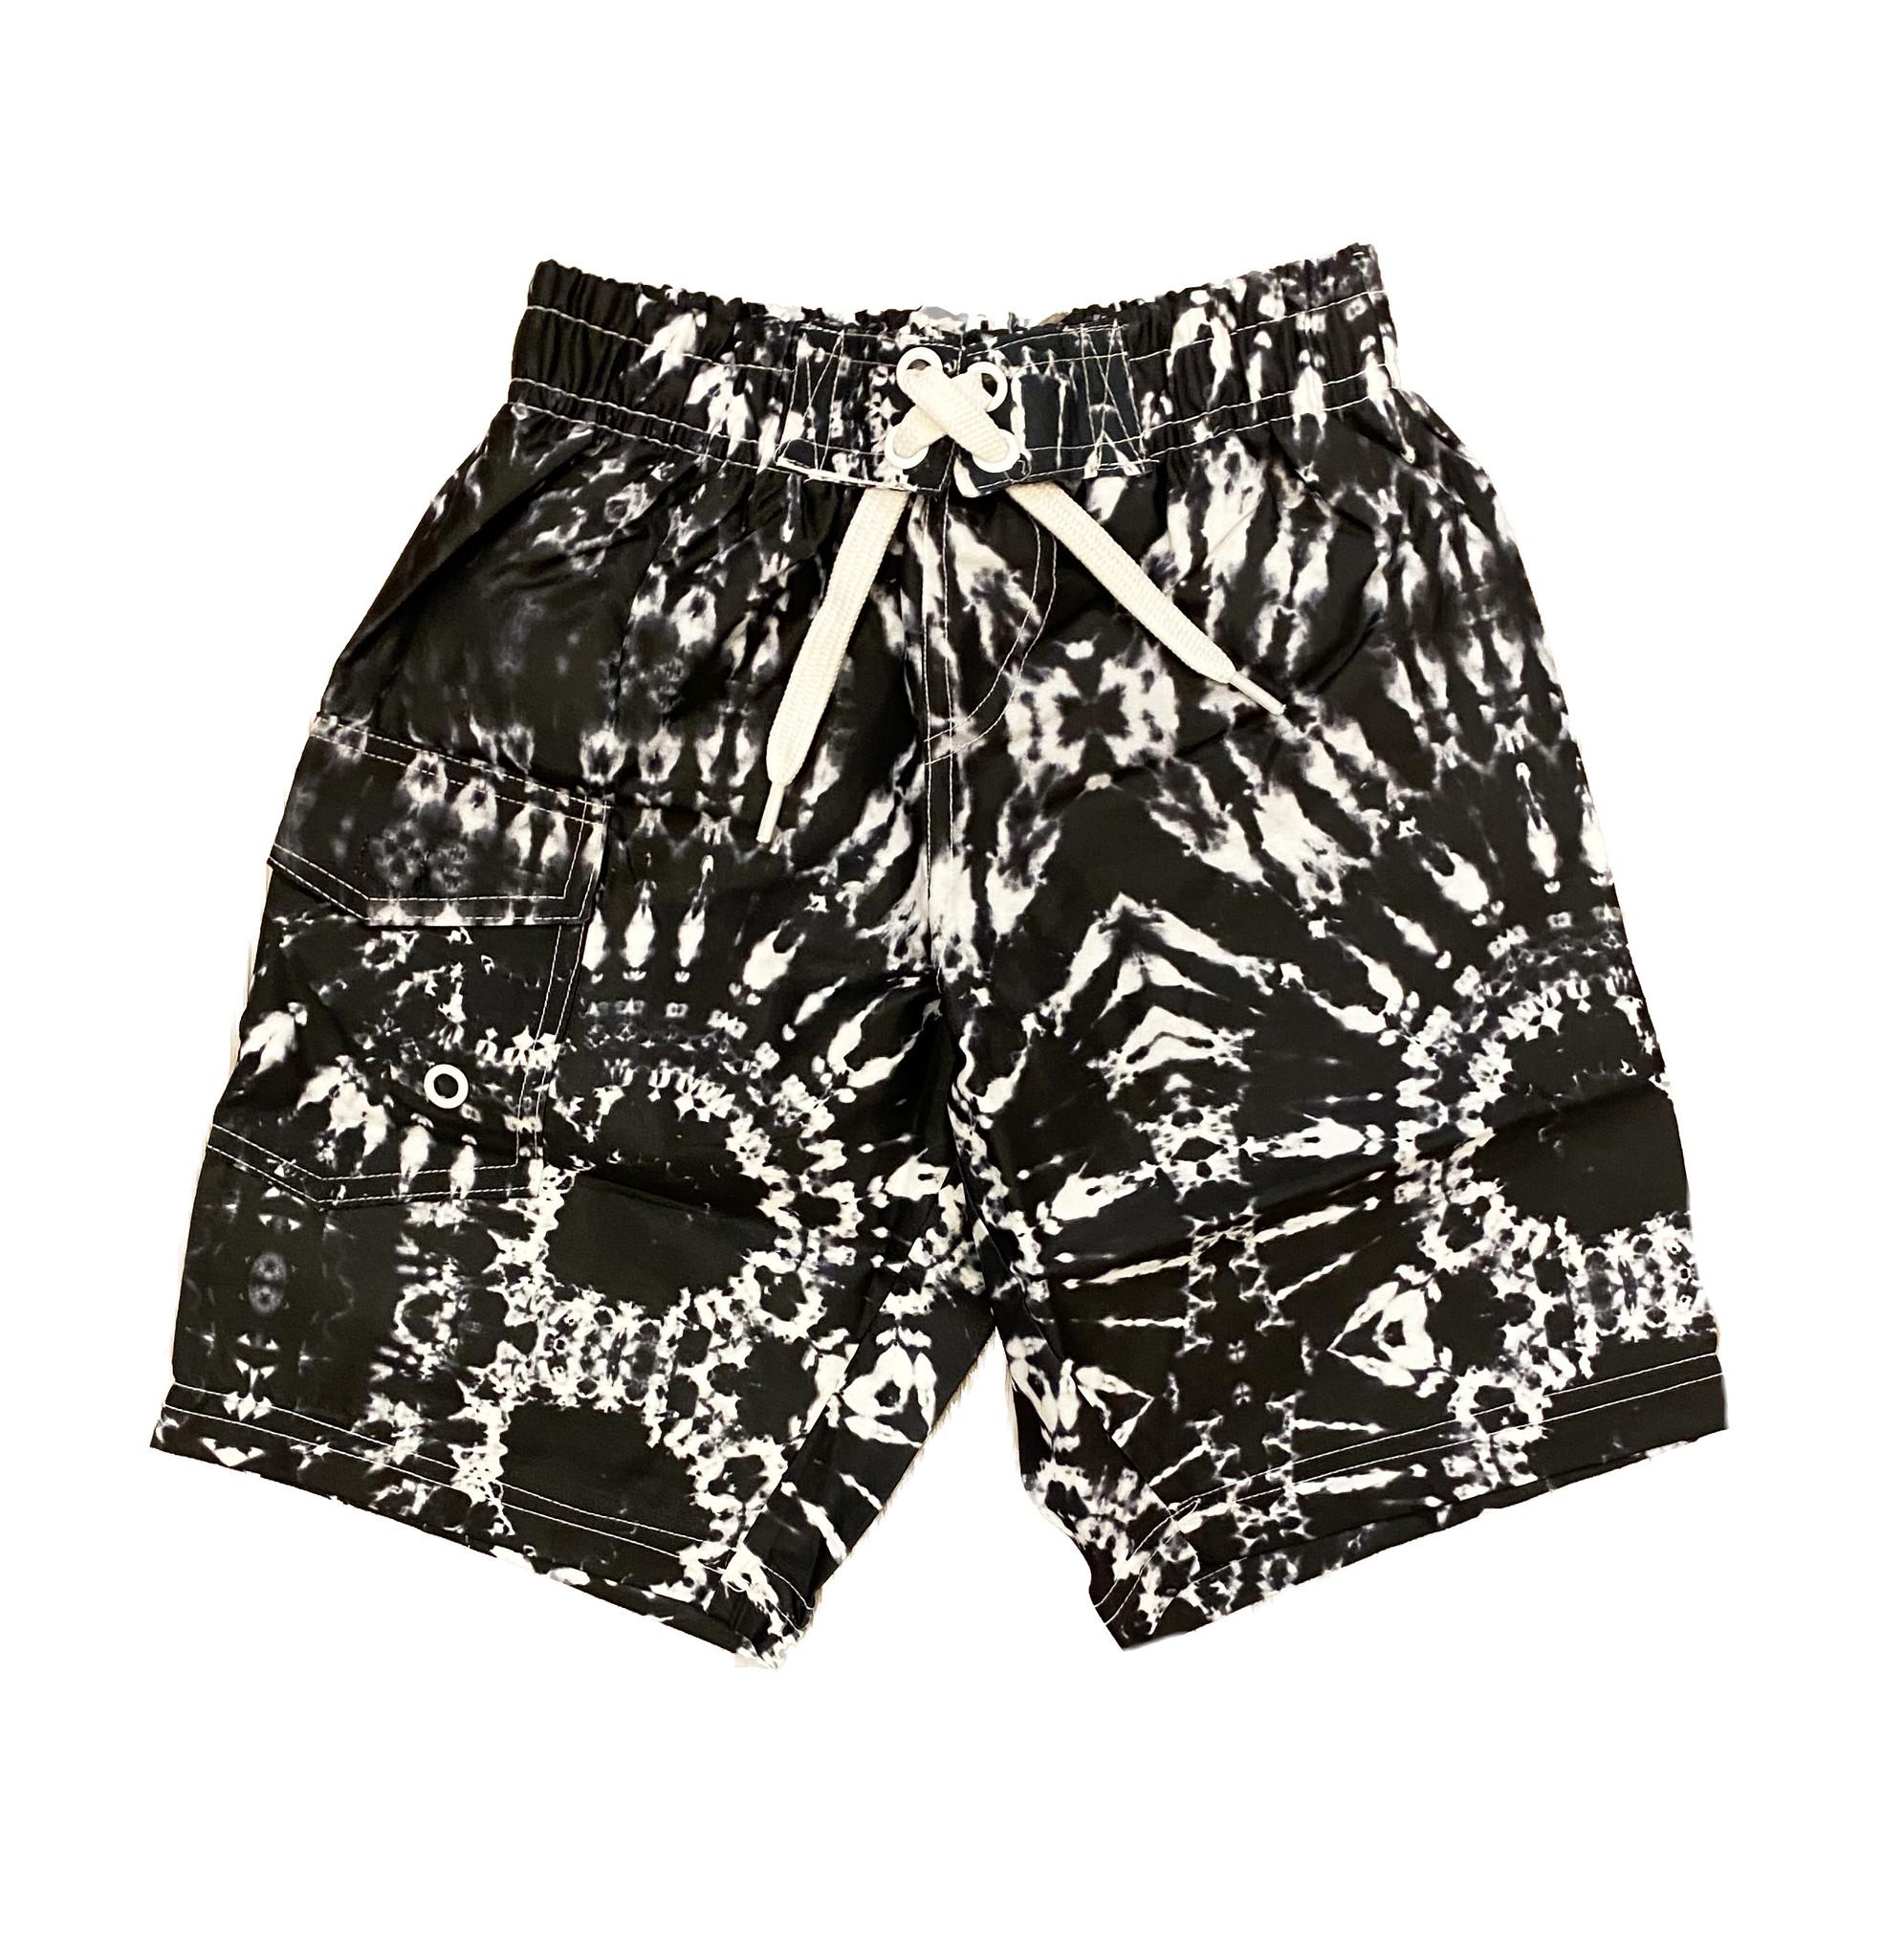 Mish Black TD Swimsuit